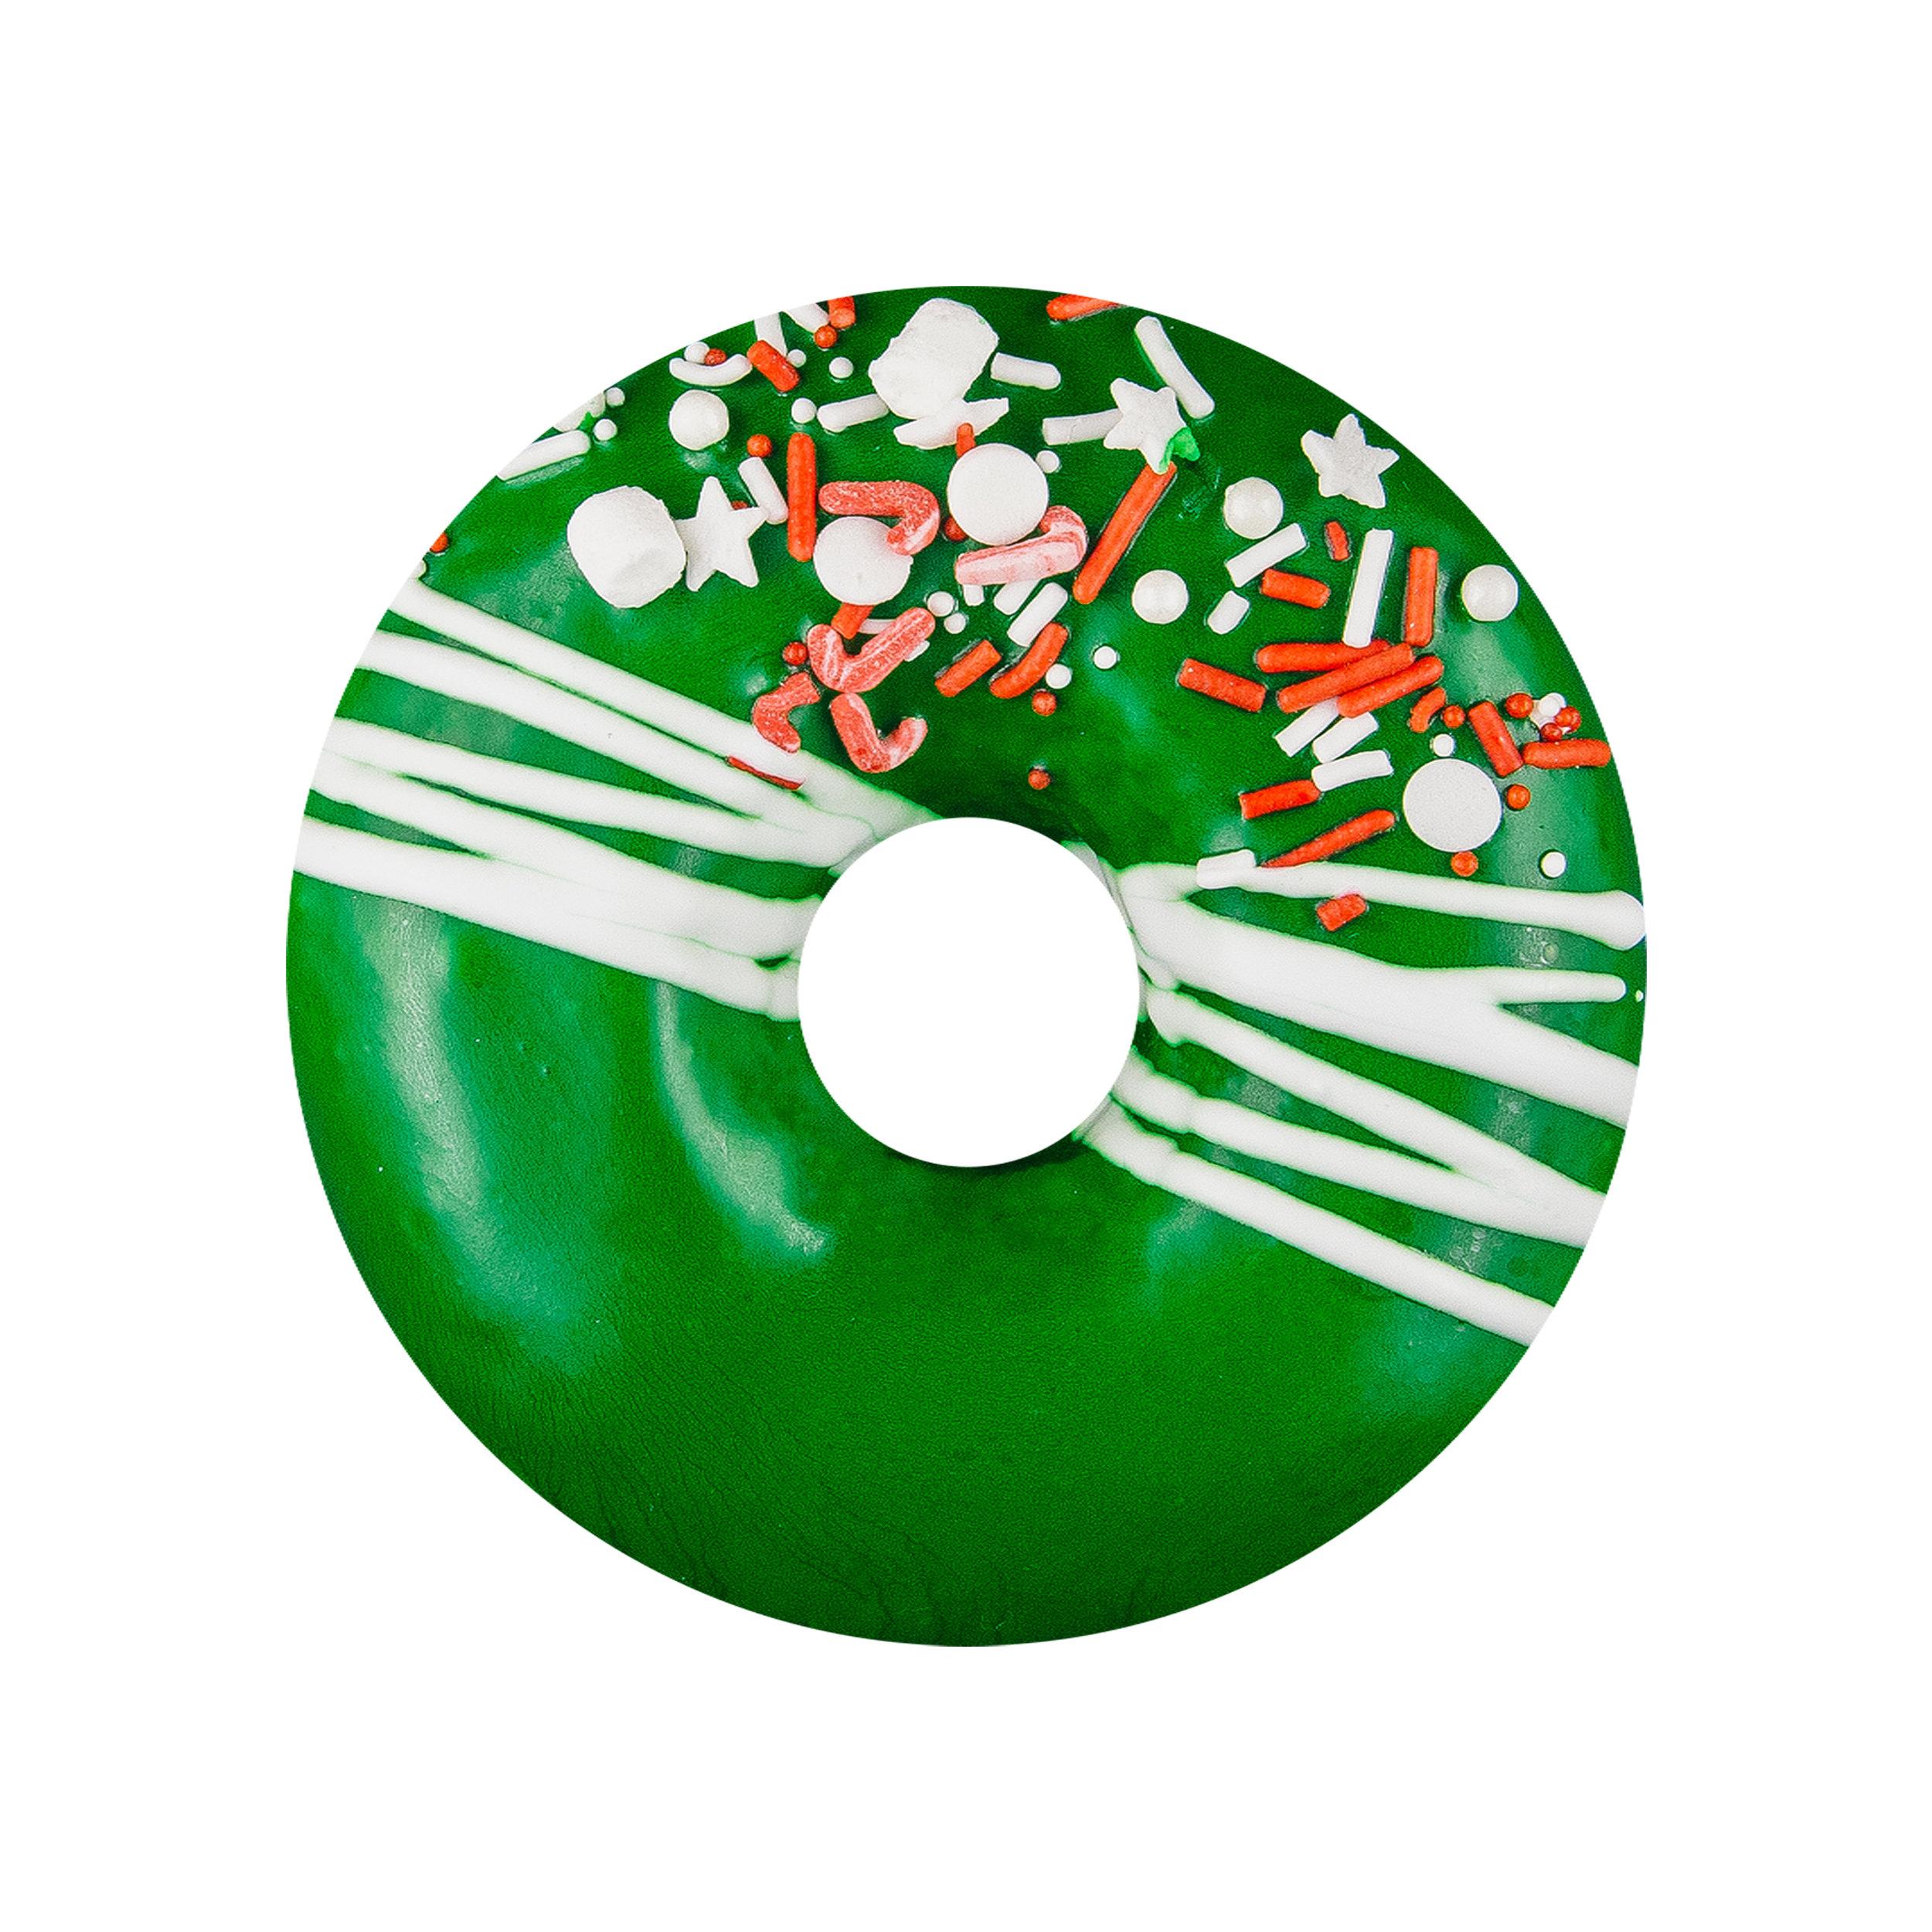 GREEN CANDY CANE LANE -